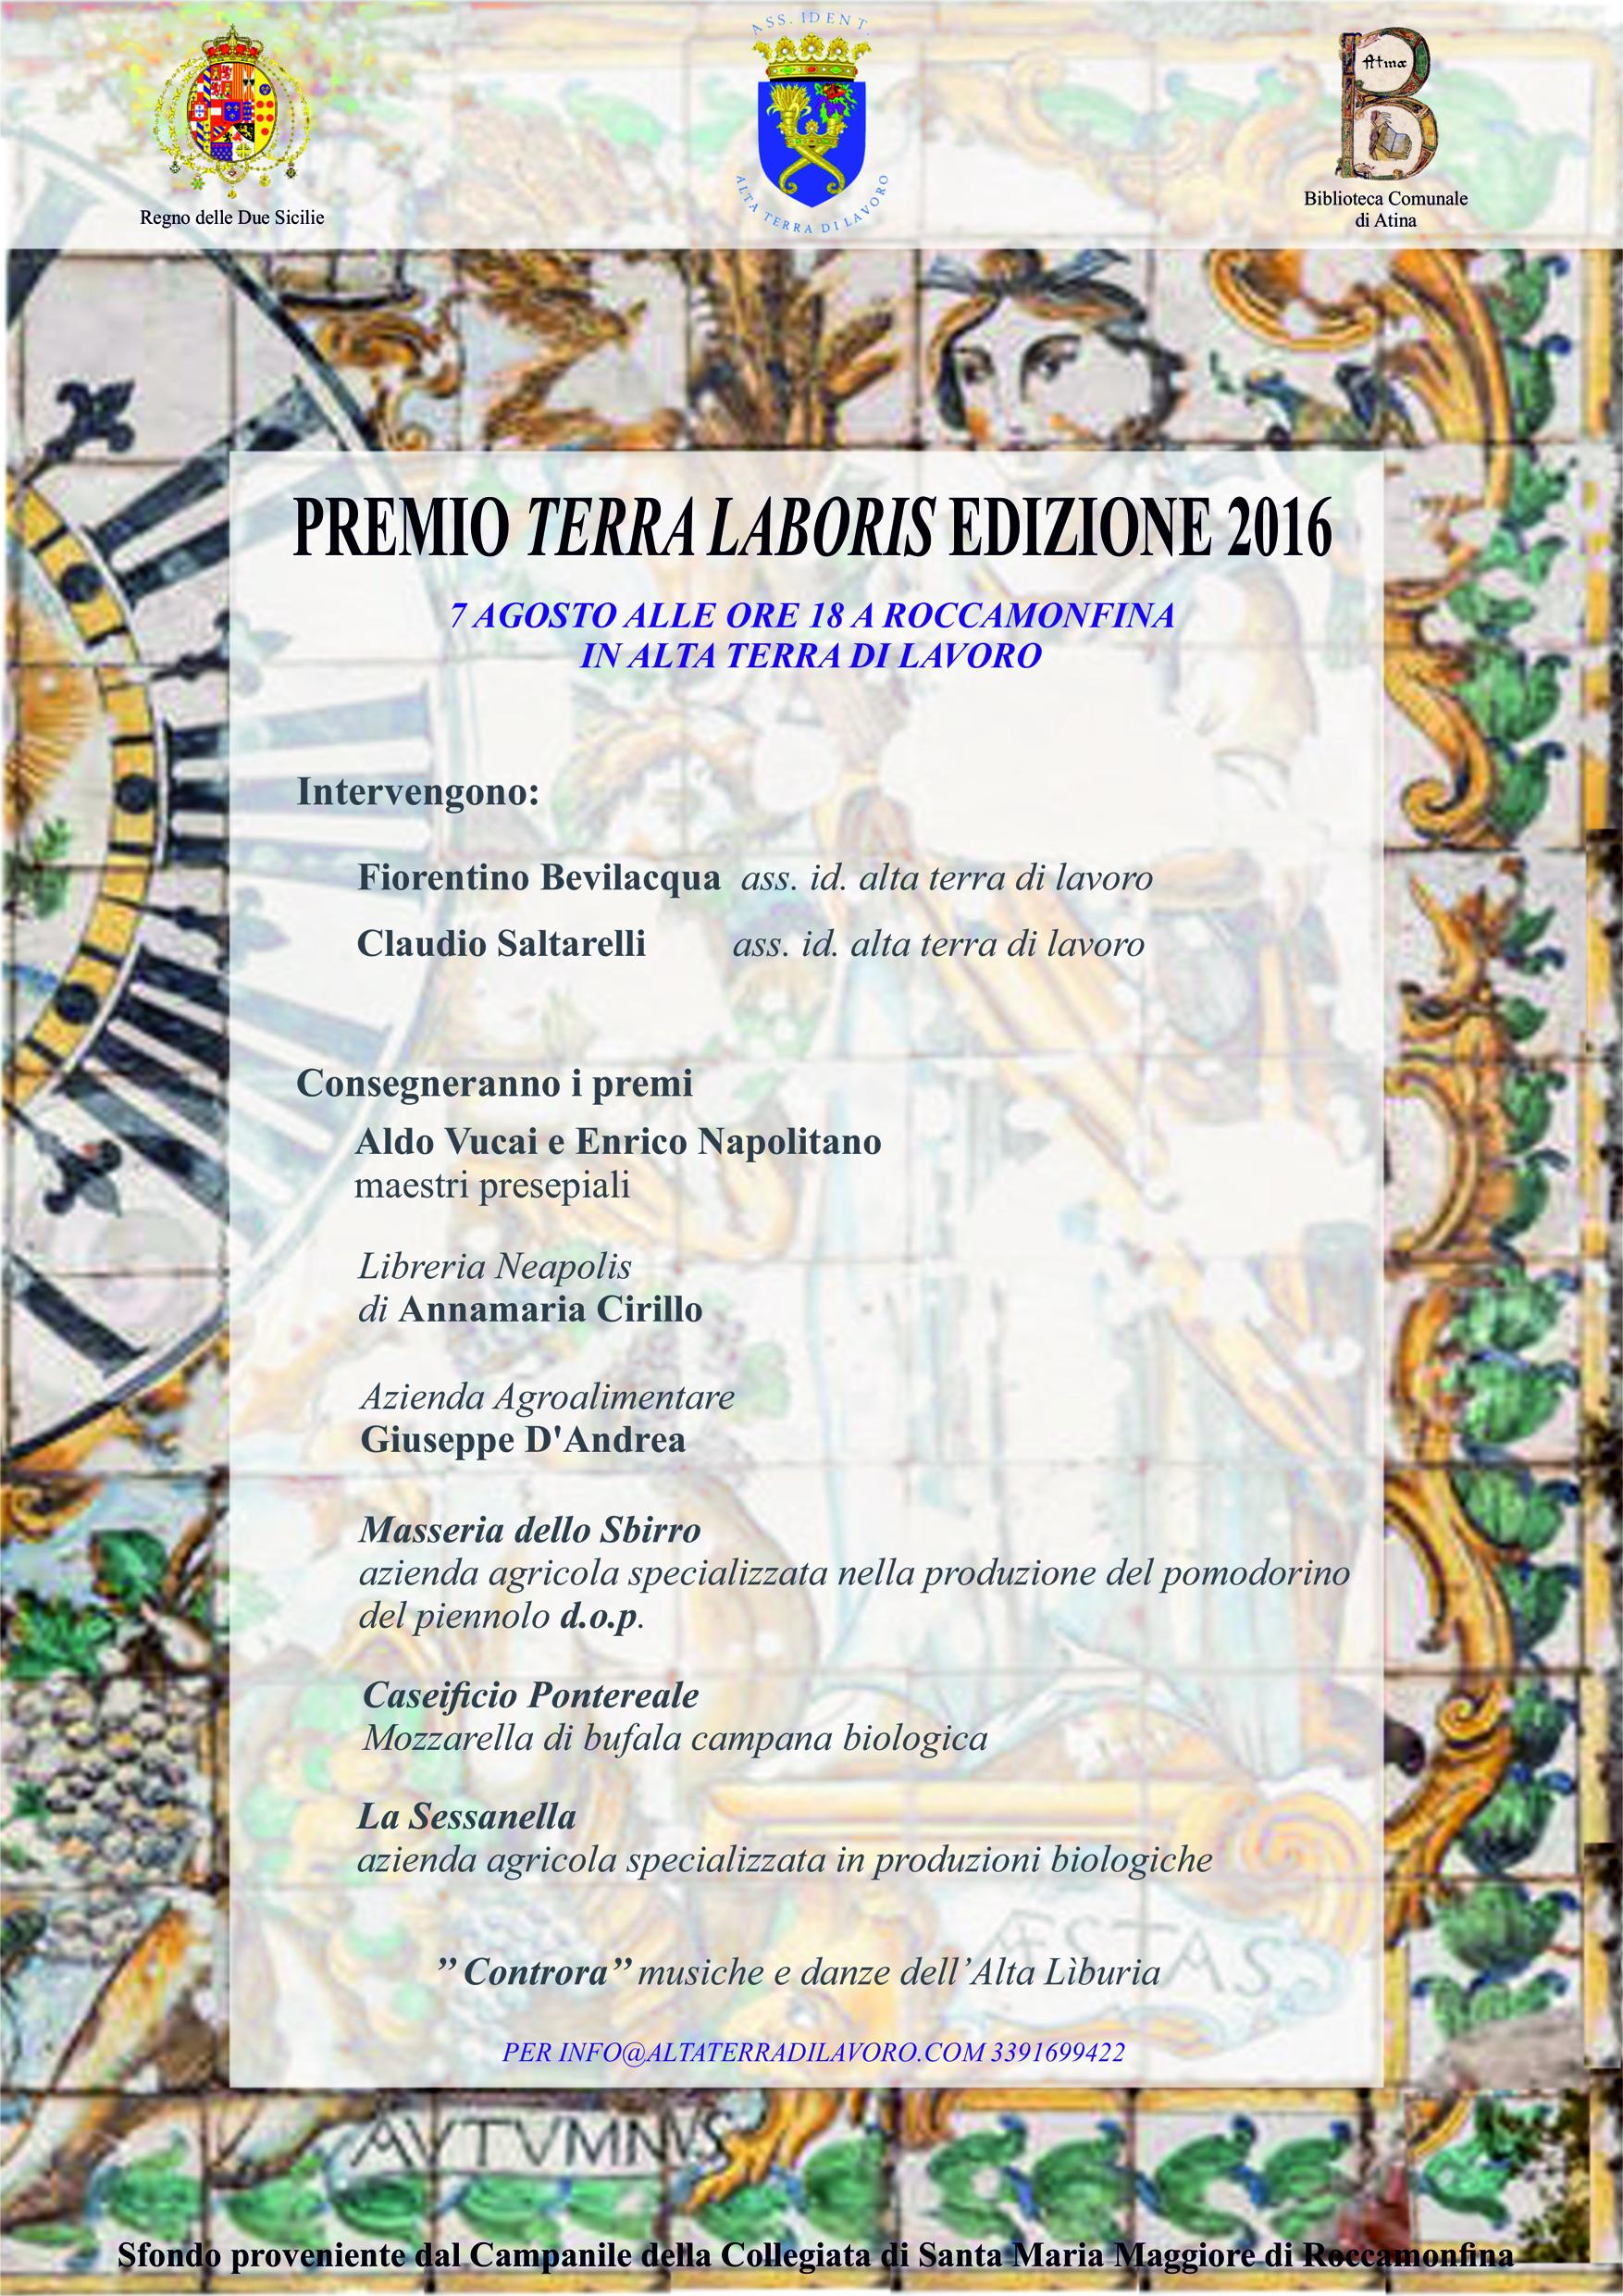 PREMIO TERRA LABORIS MANIFESTO 7 AGOSTO 20161